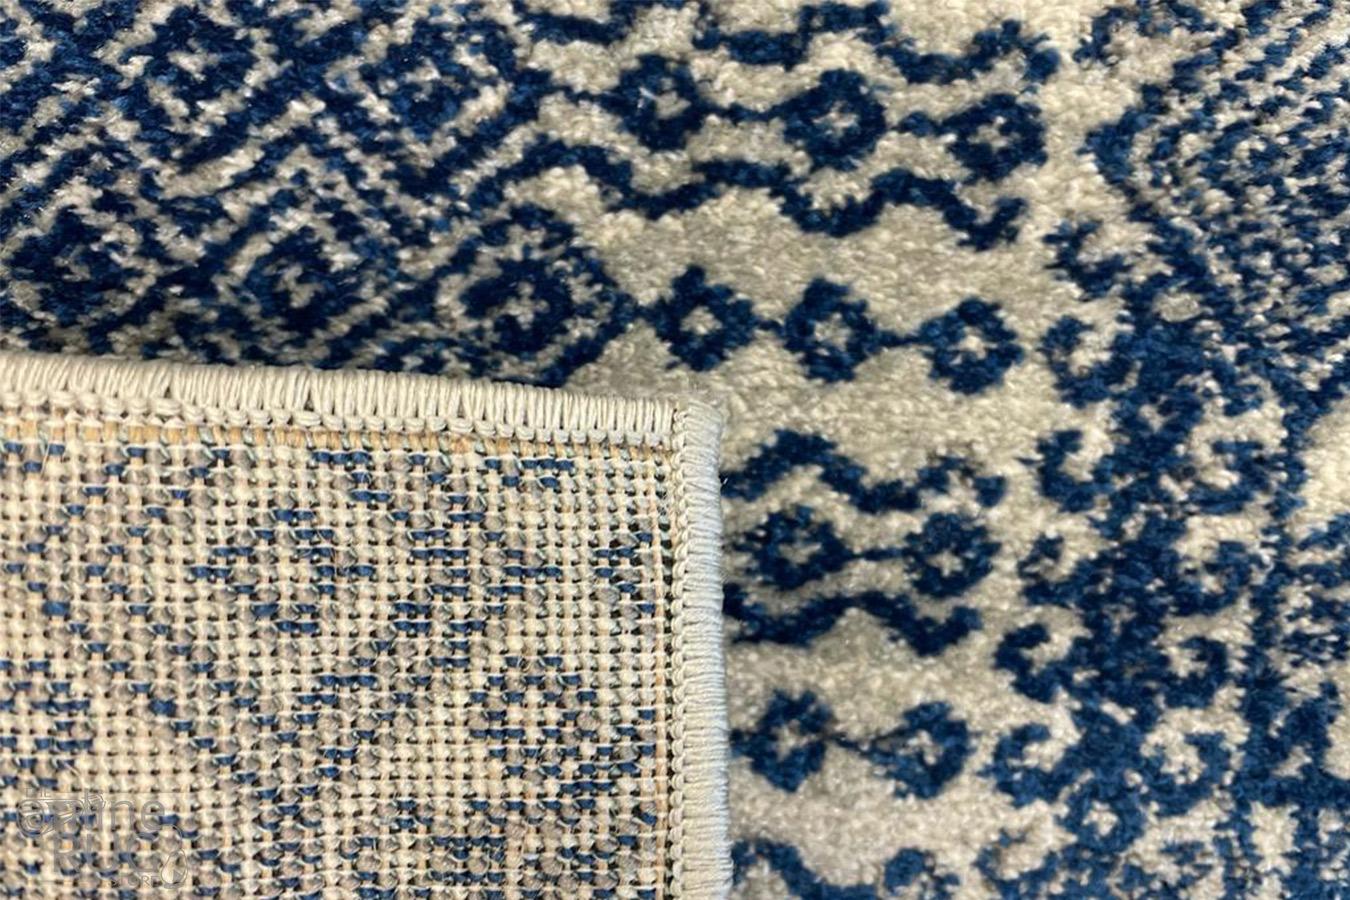 Mystique Navy and White Vintage Patterned Rug